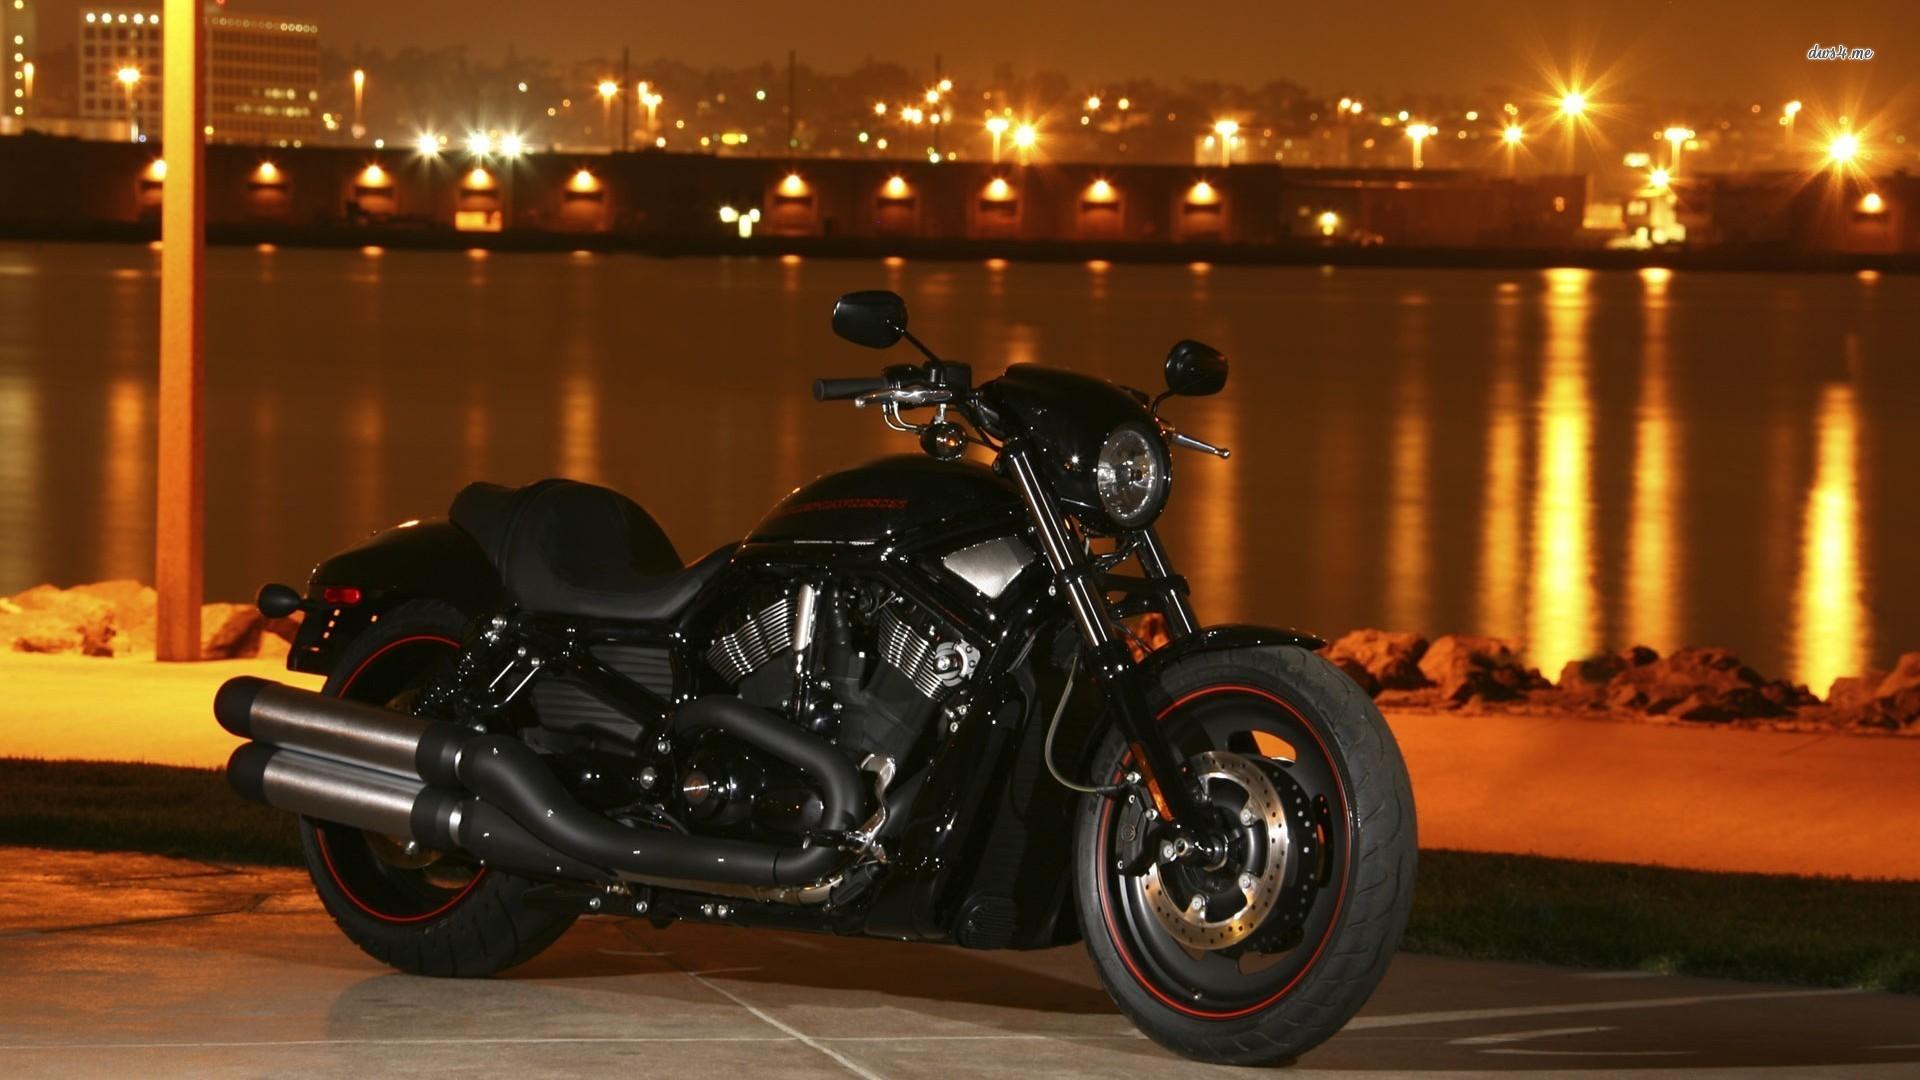 Amazing Black Motorcycle Harley Davidson Wallp 10704 1920x1080